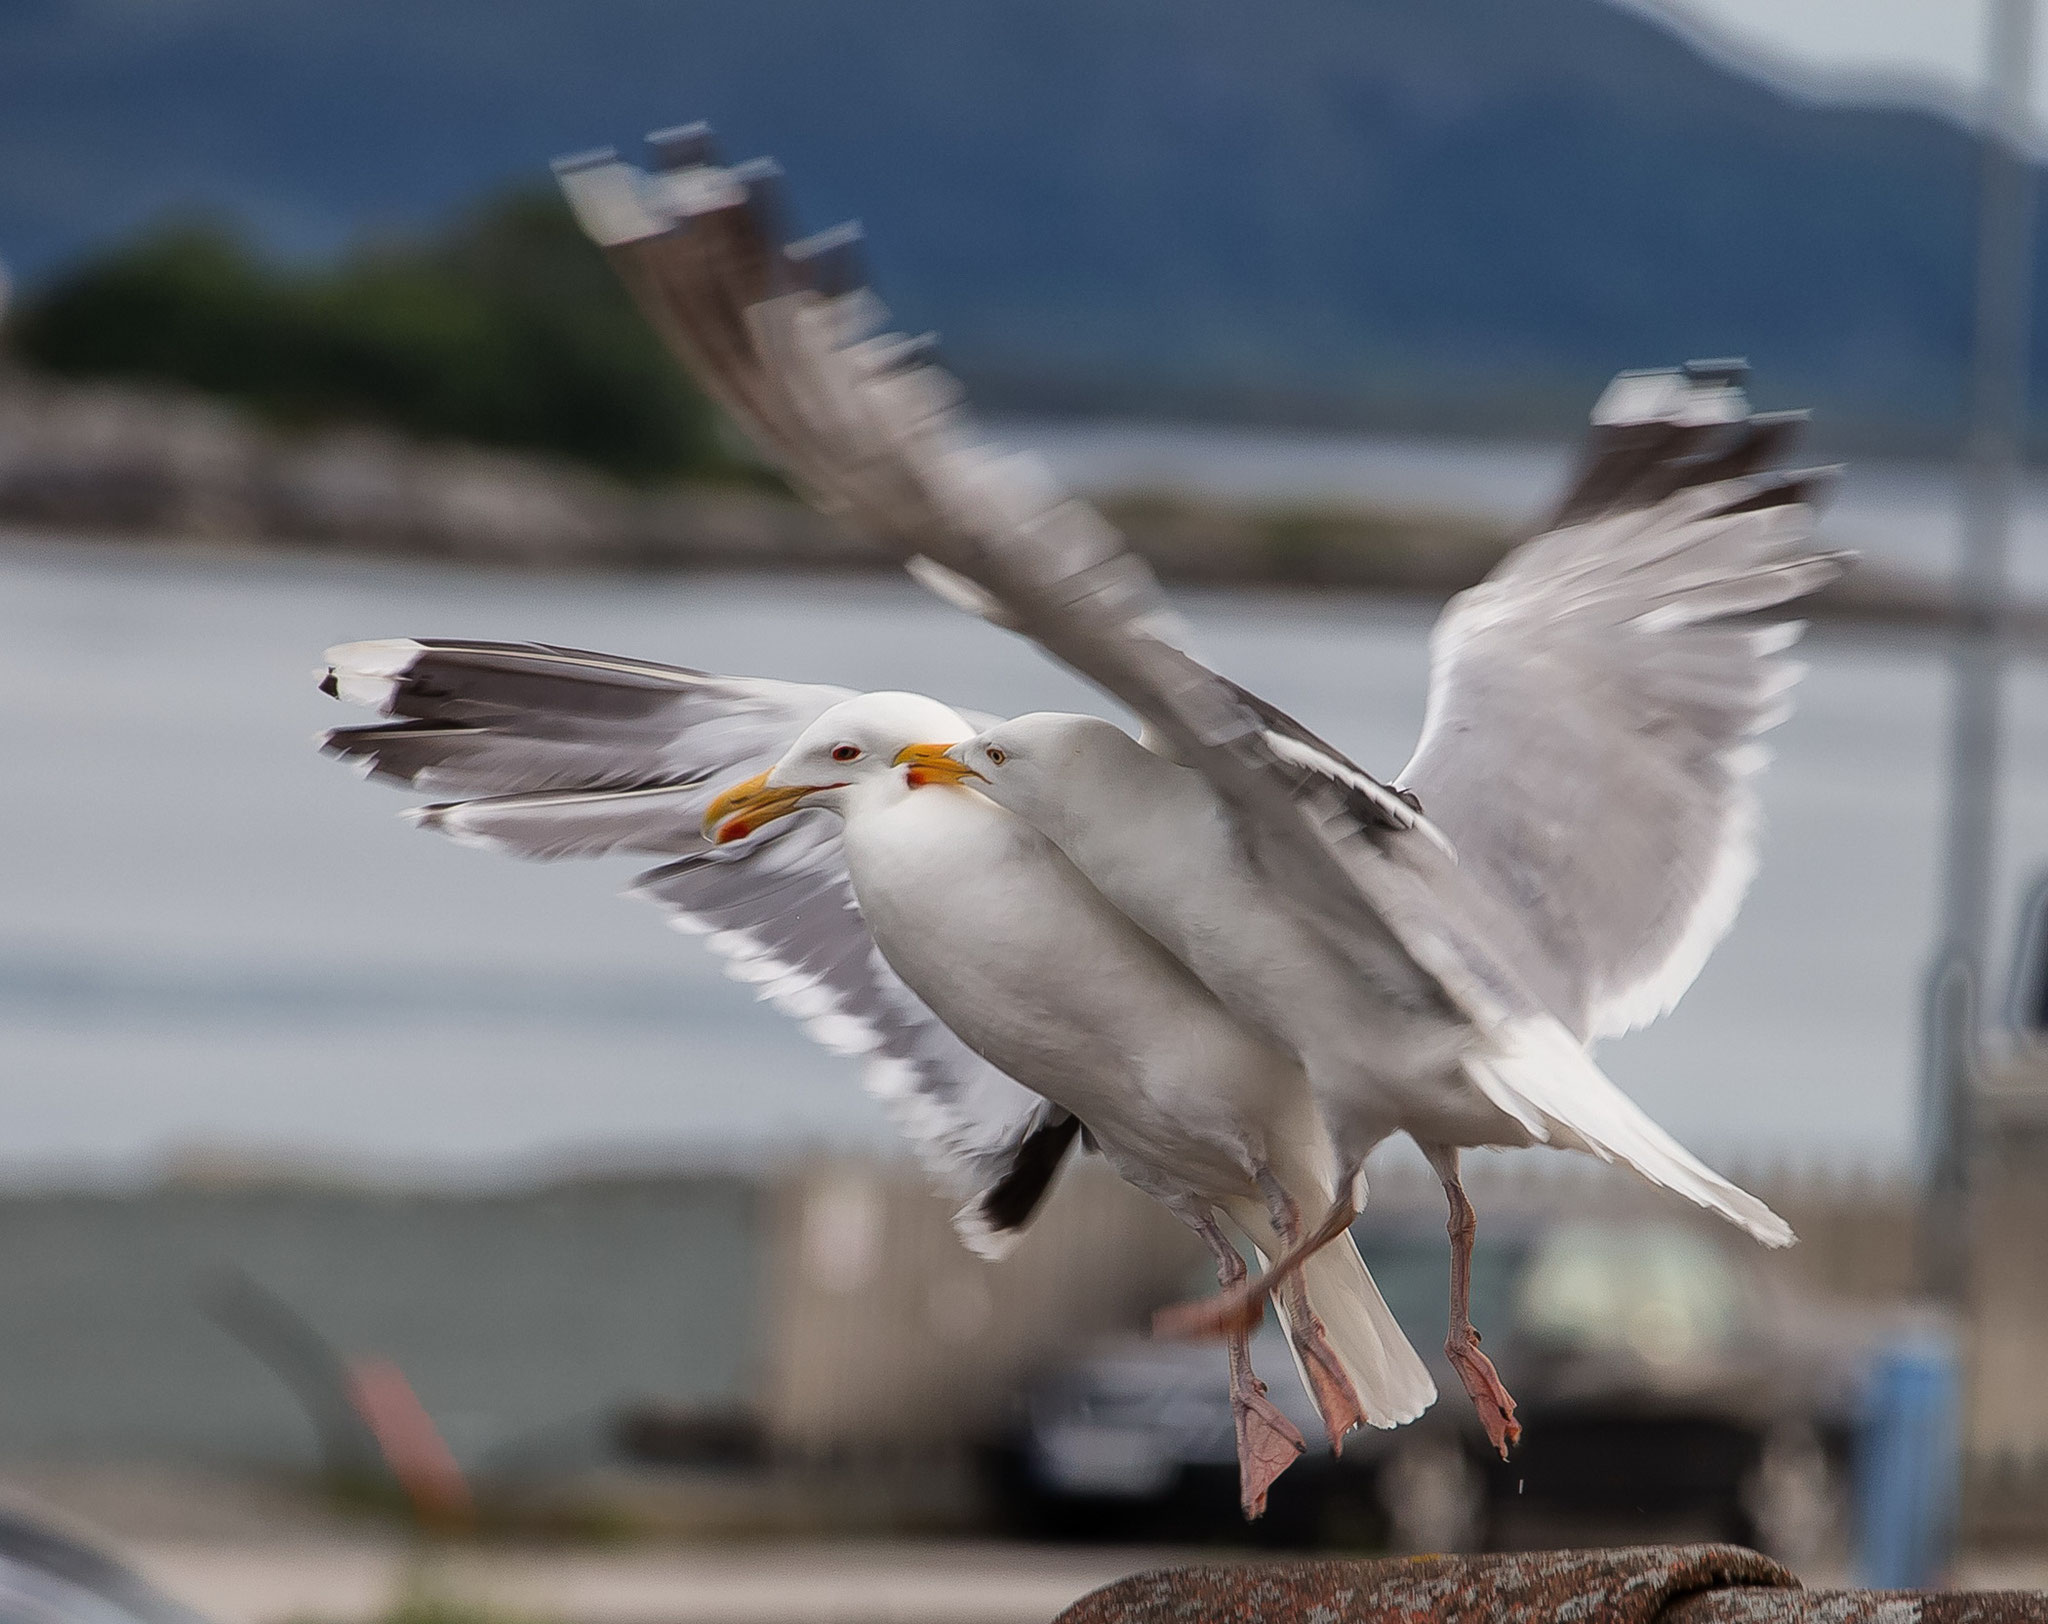 © Hans G. Lehmann | Seagulls near Atlanterhavsveien, Norway